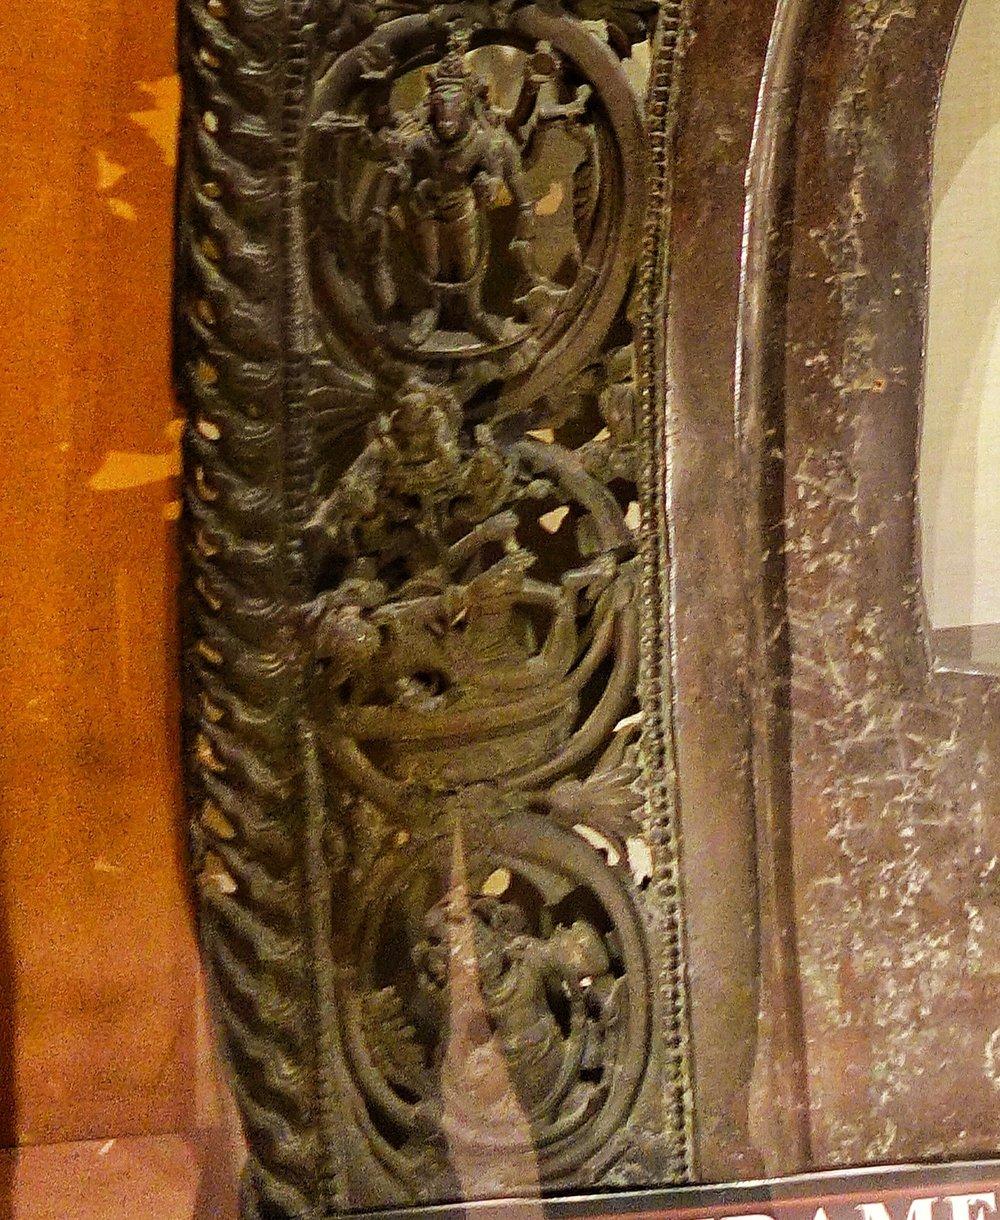 vaishnava-avatar-8thcentury-bronze-spsmuseum-srinagar-kashmir